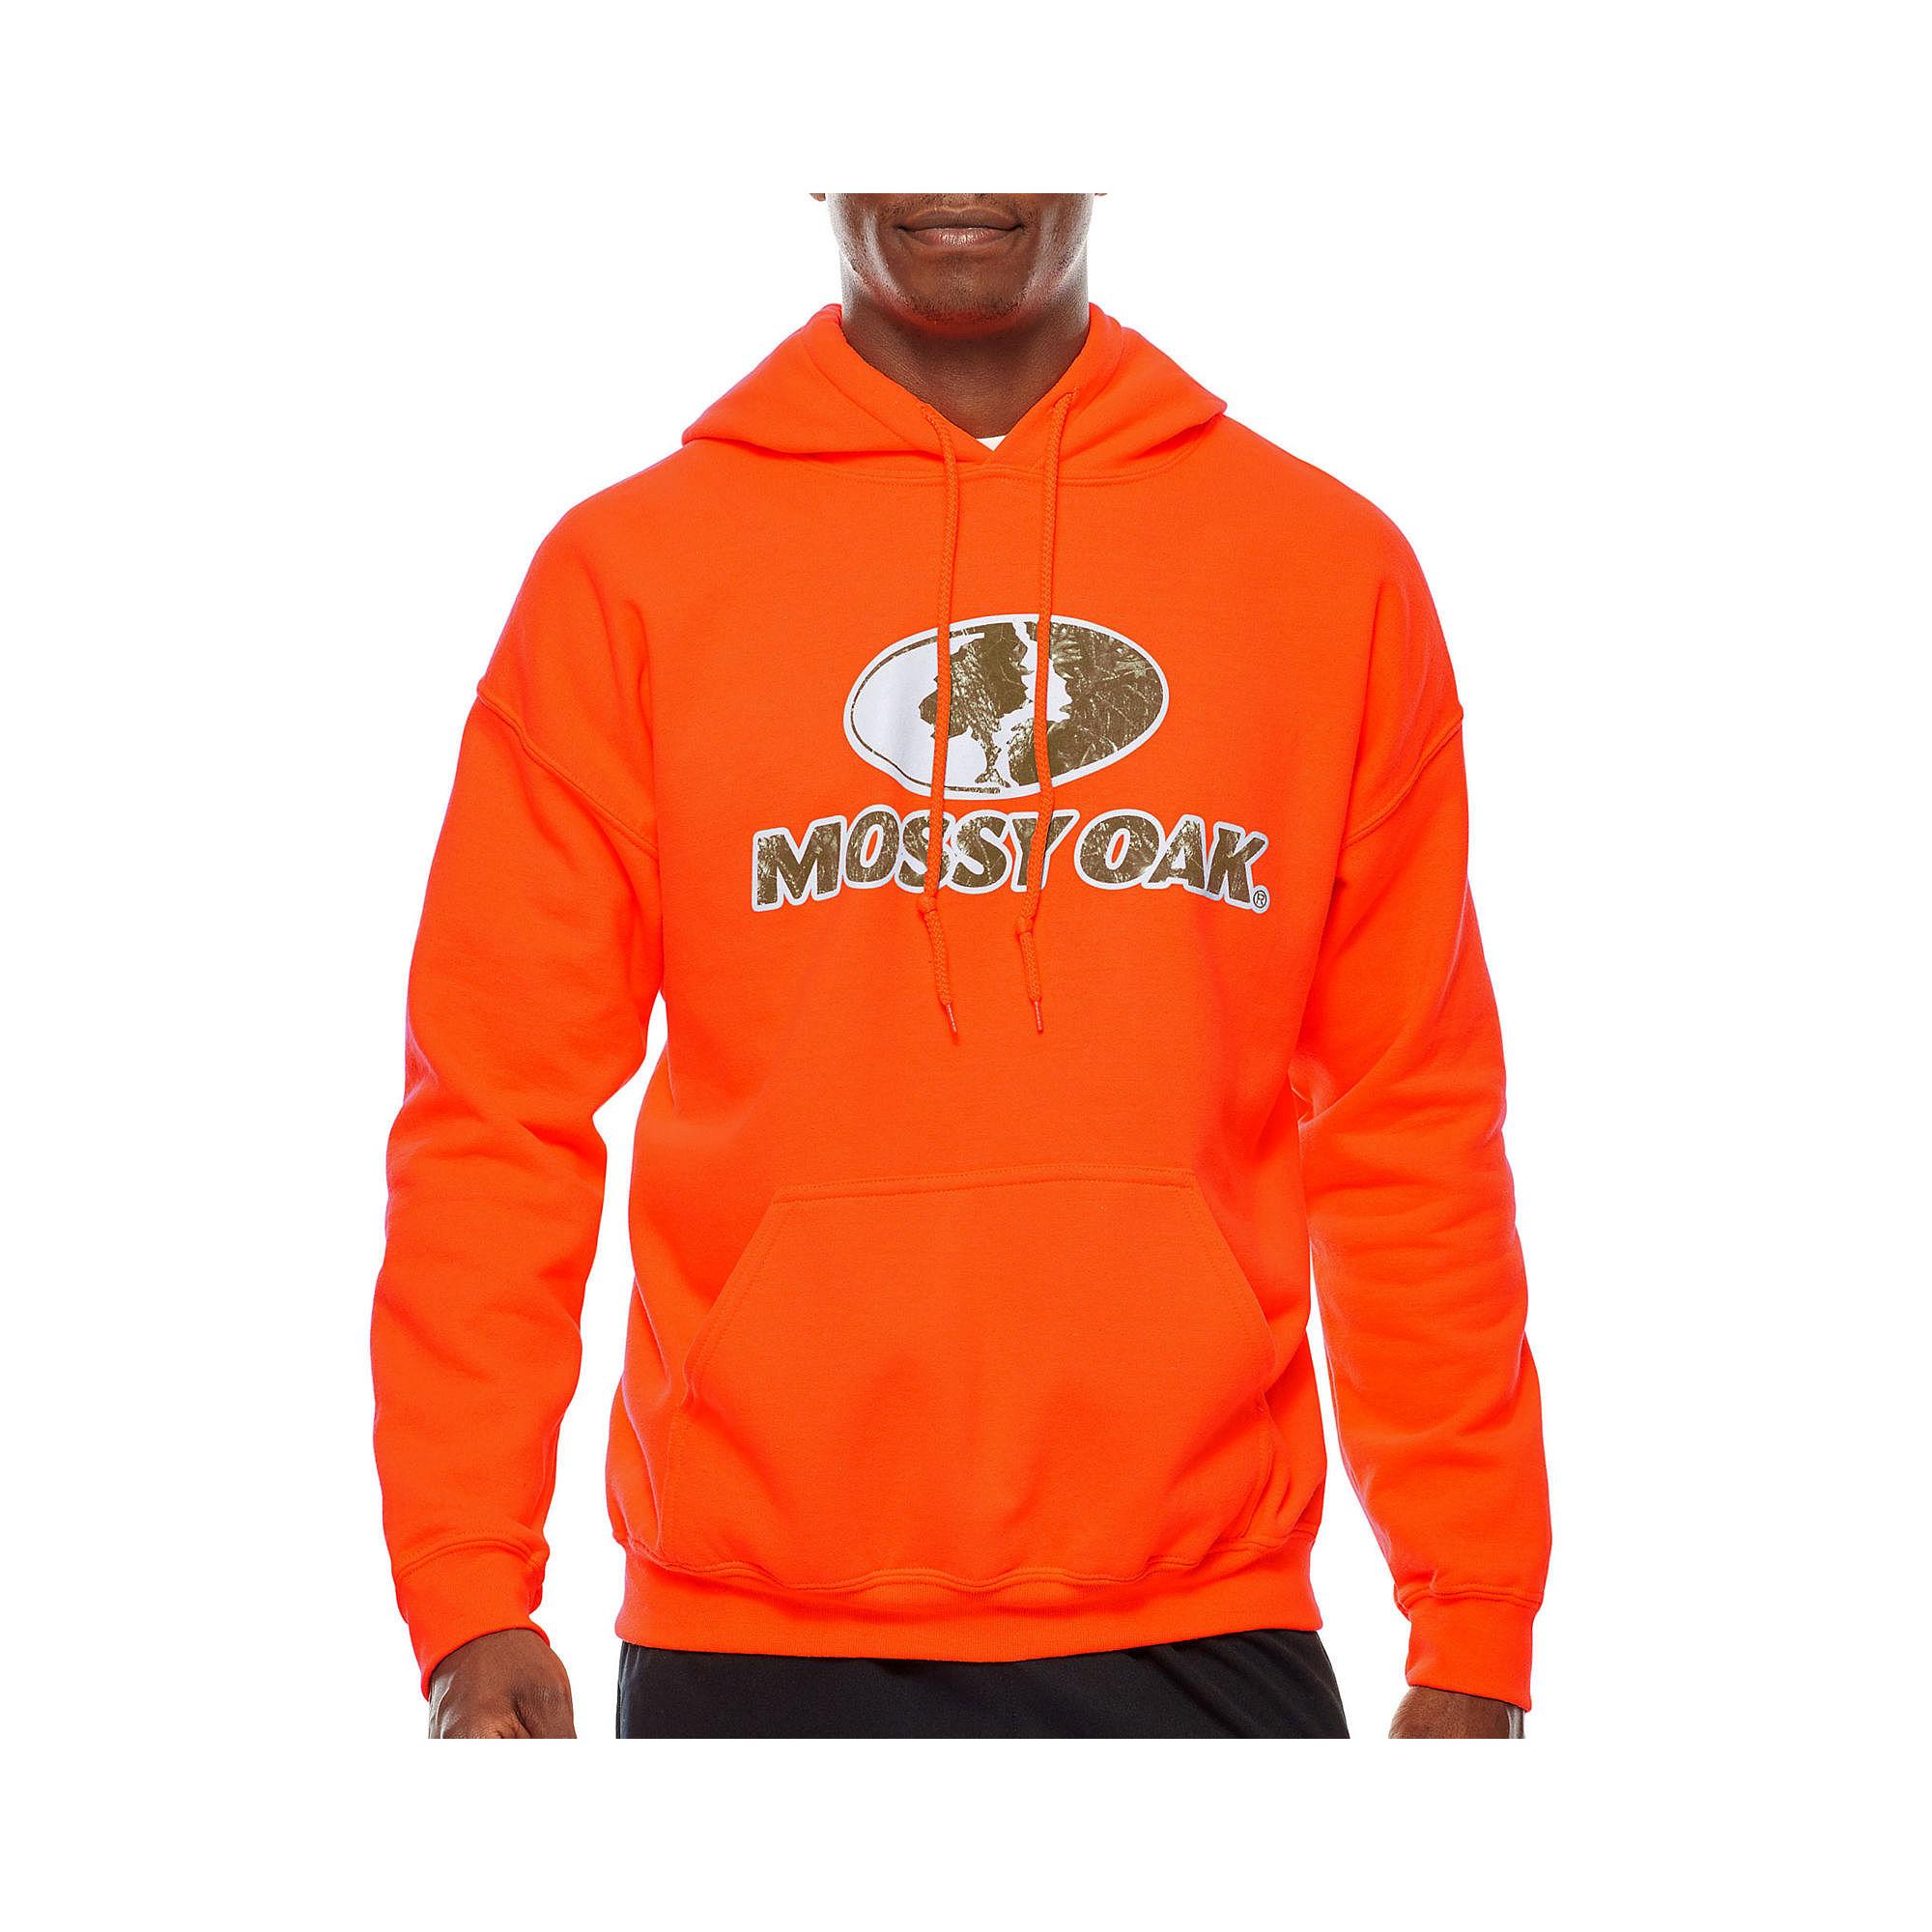 Mossy Oak Graphic Hoodie | Top, Sweatshirt and Clothing